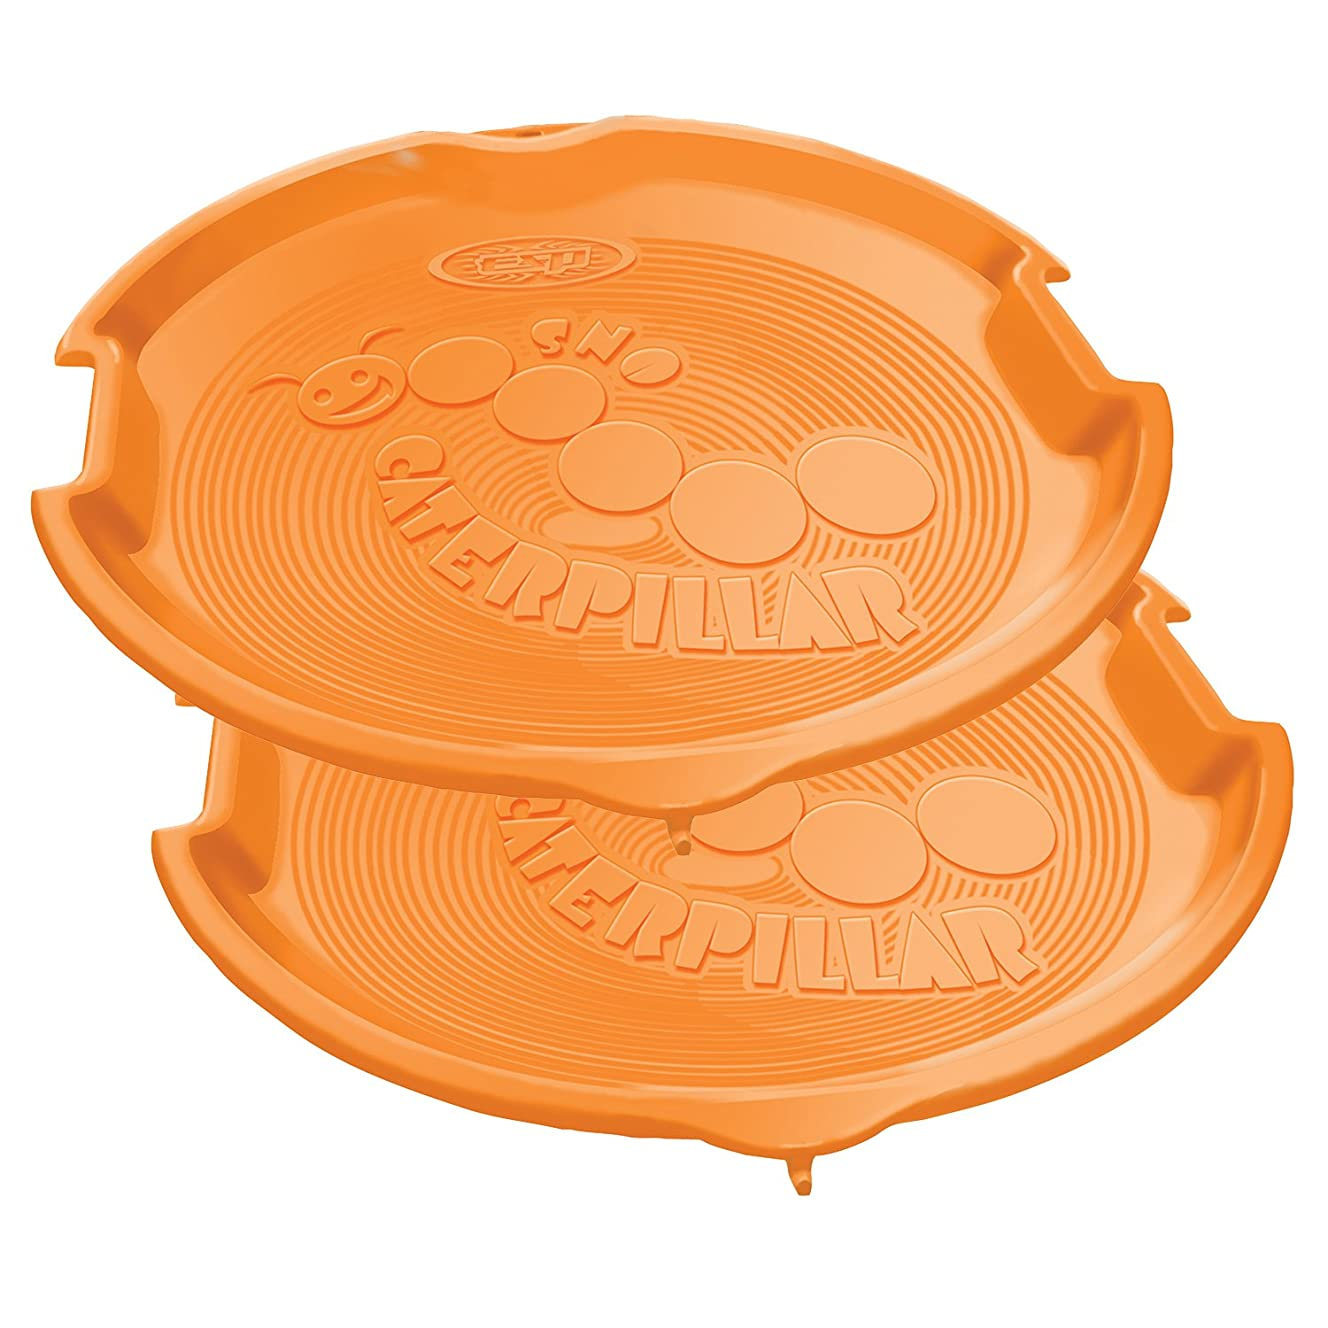 Emsco Group ESP 1055-2 Snow Caterpillar Linkable Disc Sled, 26 Inch 2 Pack, Orange